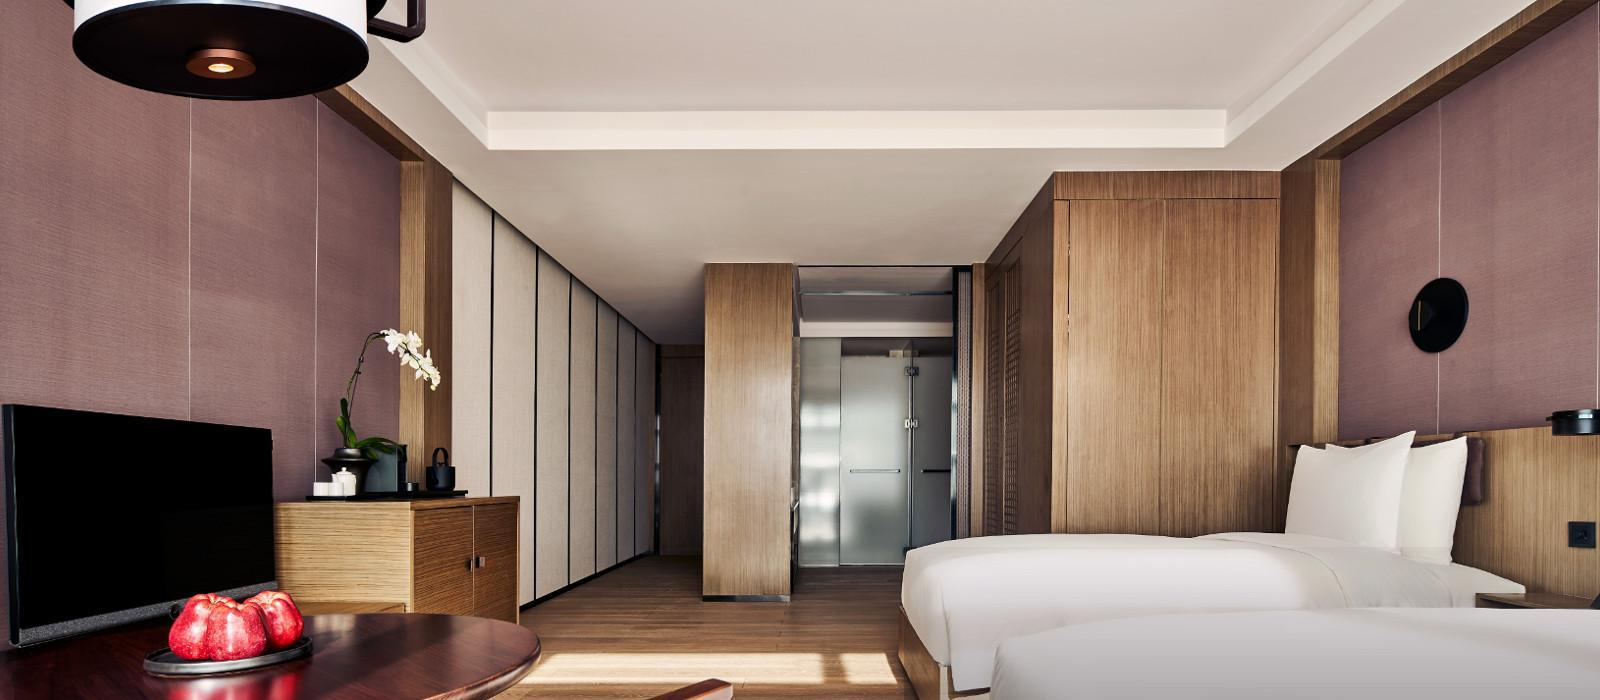 璞瑄酒店(The PuXuan Hotel and Spa)【 北京,中国】 酒店  bjlyldr.ss79.net